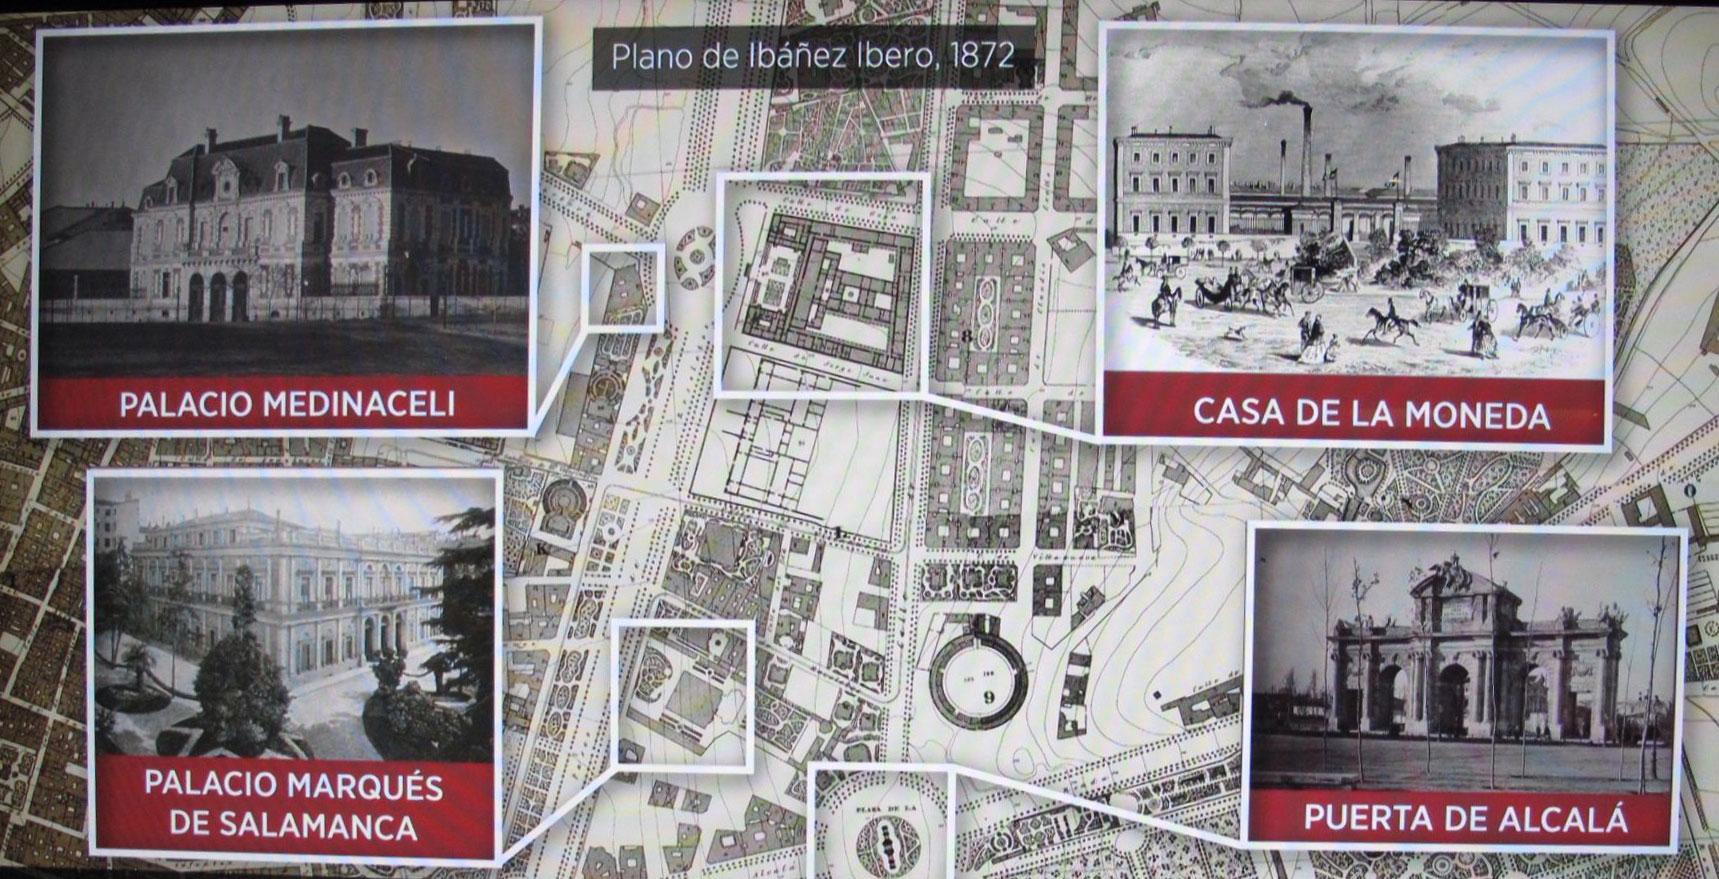 museo arqueologico nacional_man_madrid_arquitectura monumental